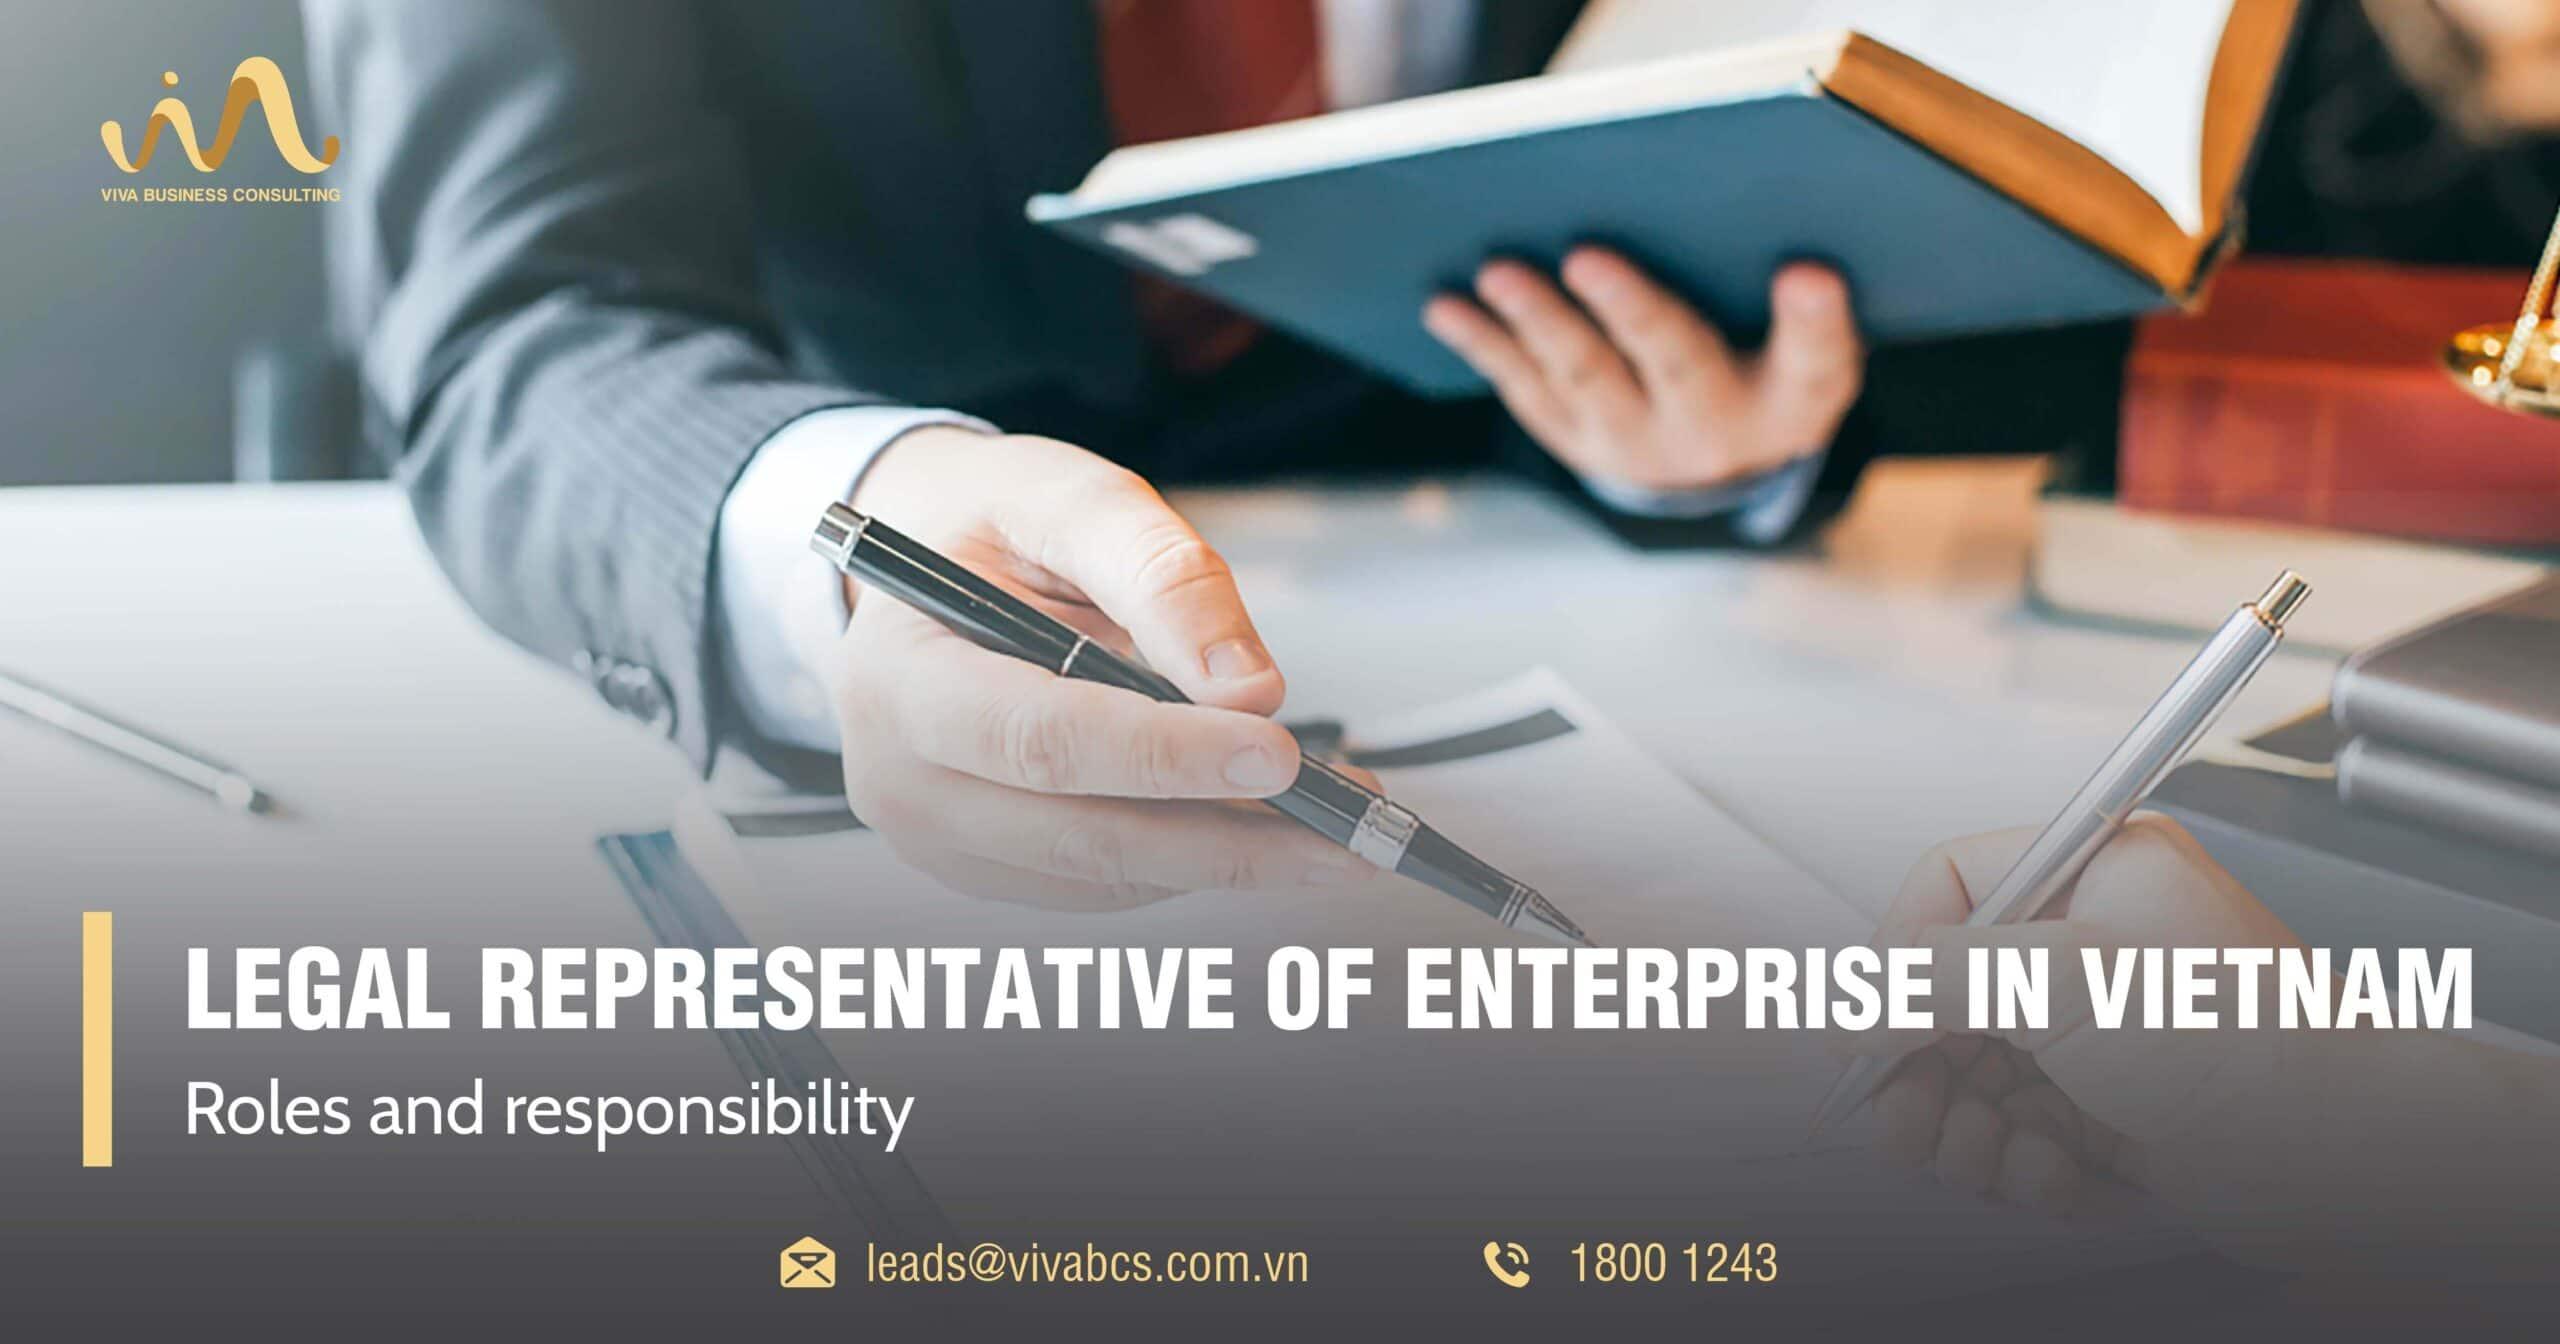 Legal representative of enterprise in Vietnam